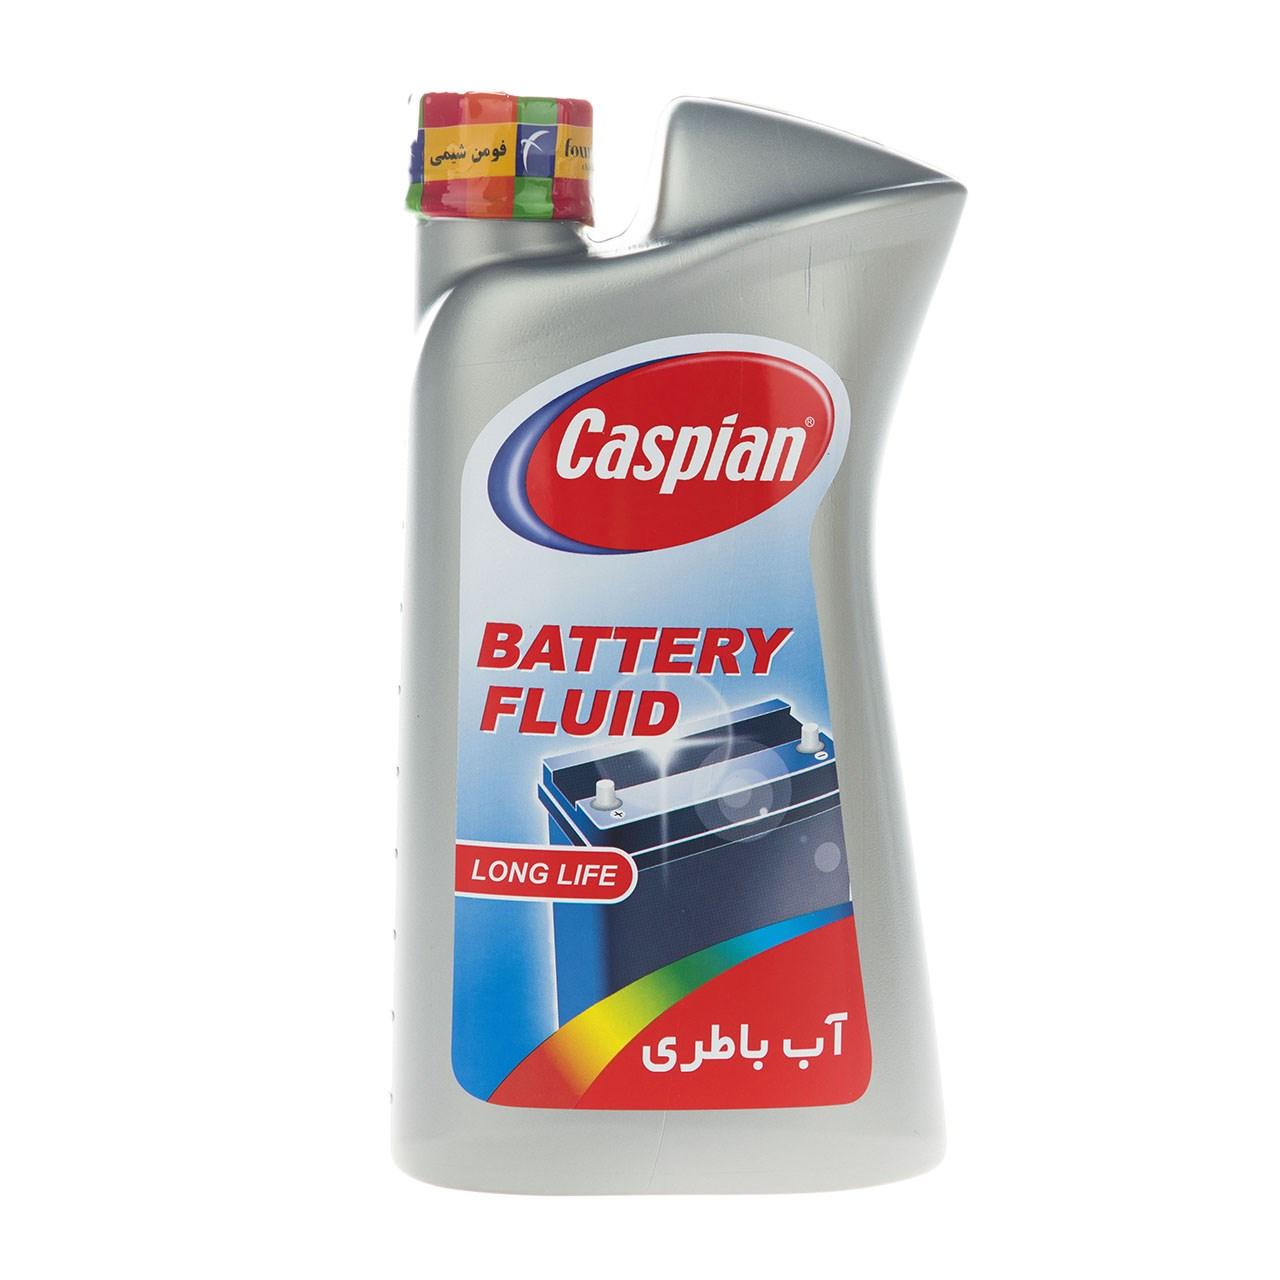 آب باتری خودرو کاسپین مدل Long Life حجم 1 لیتر